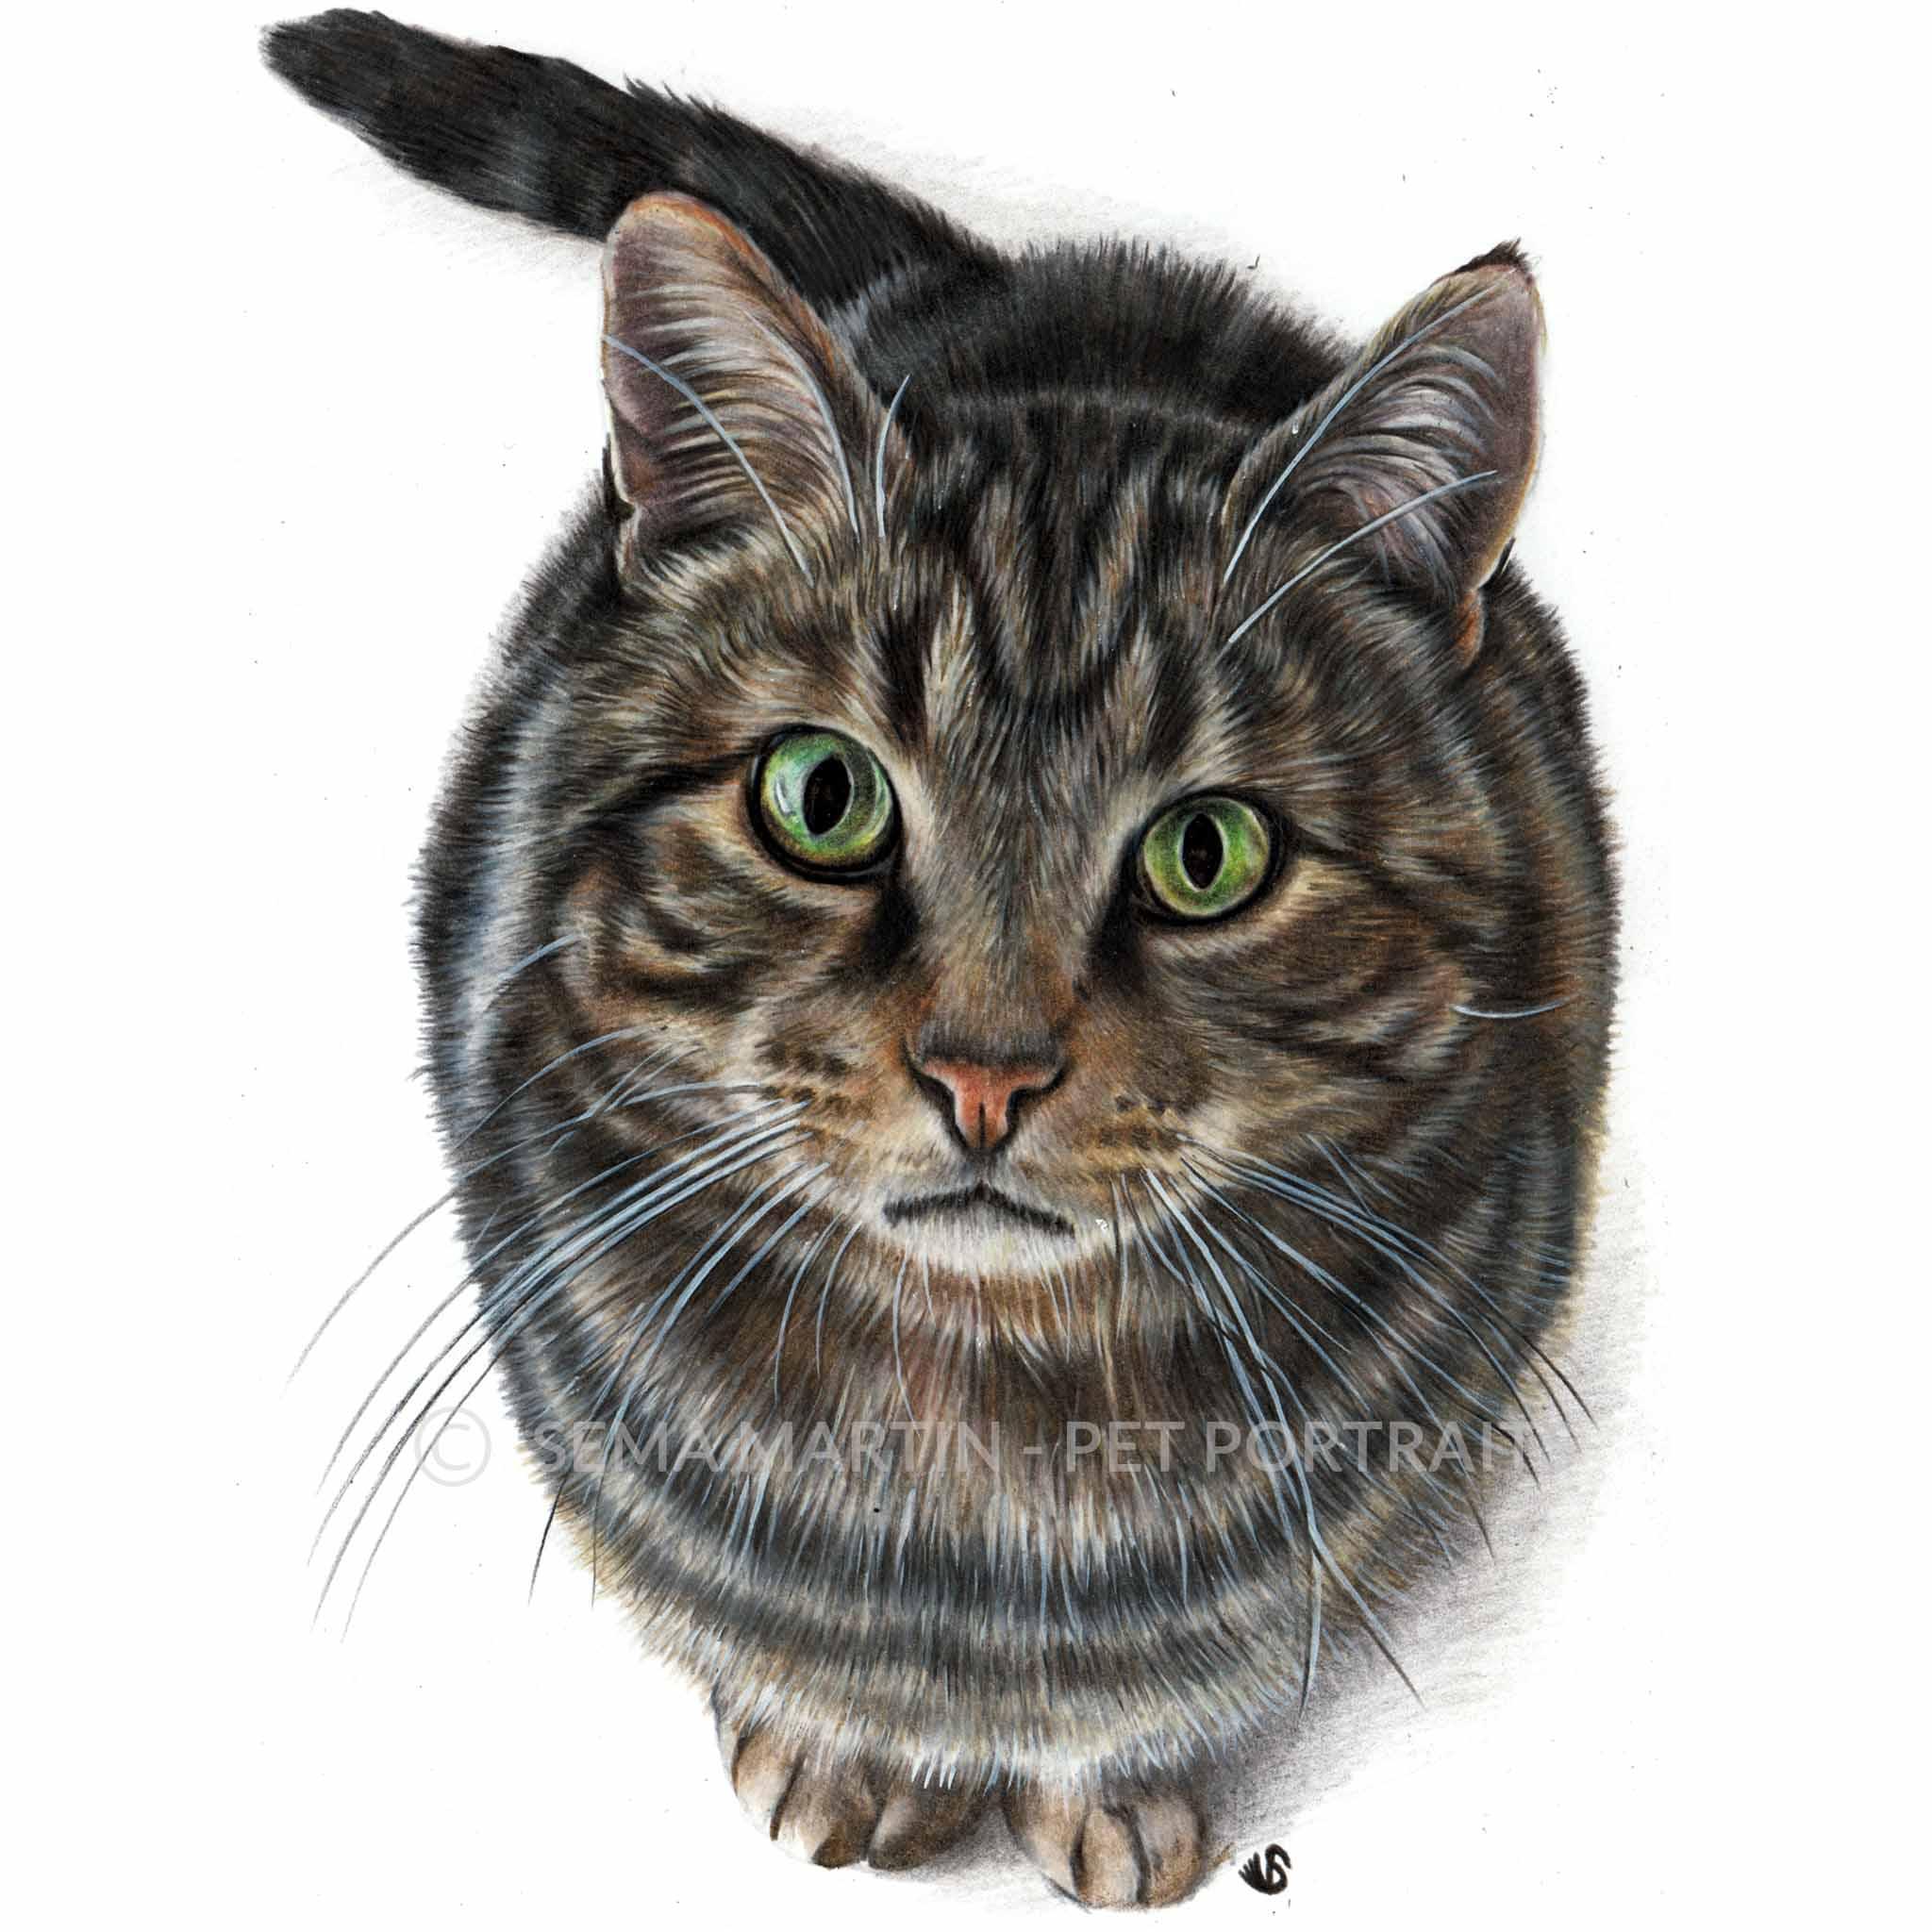 'Henry' - AUS, 5.8 x 8.3 inches, 2018, Colour Pencil Cat Portrait by Sema Martin